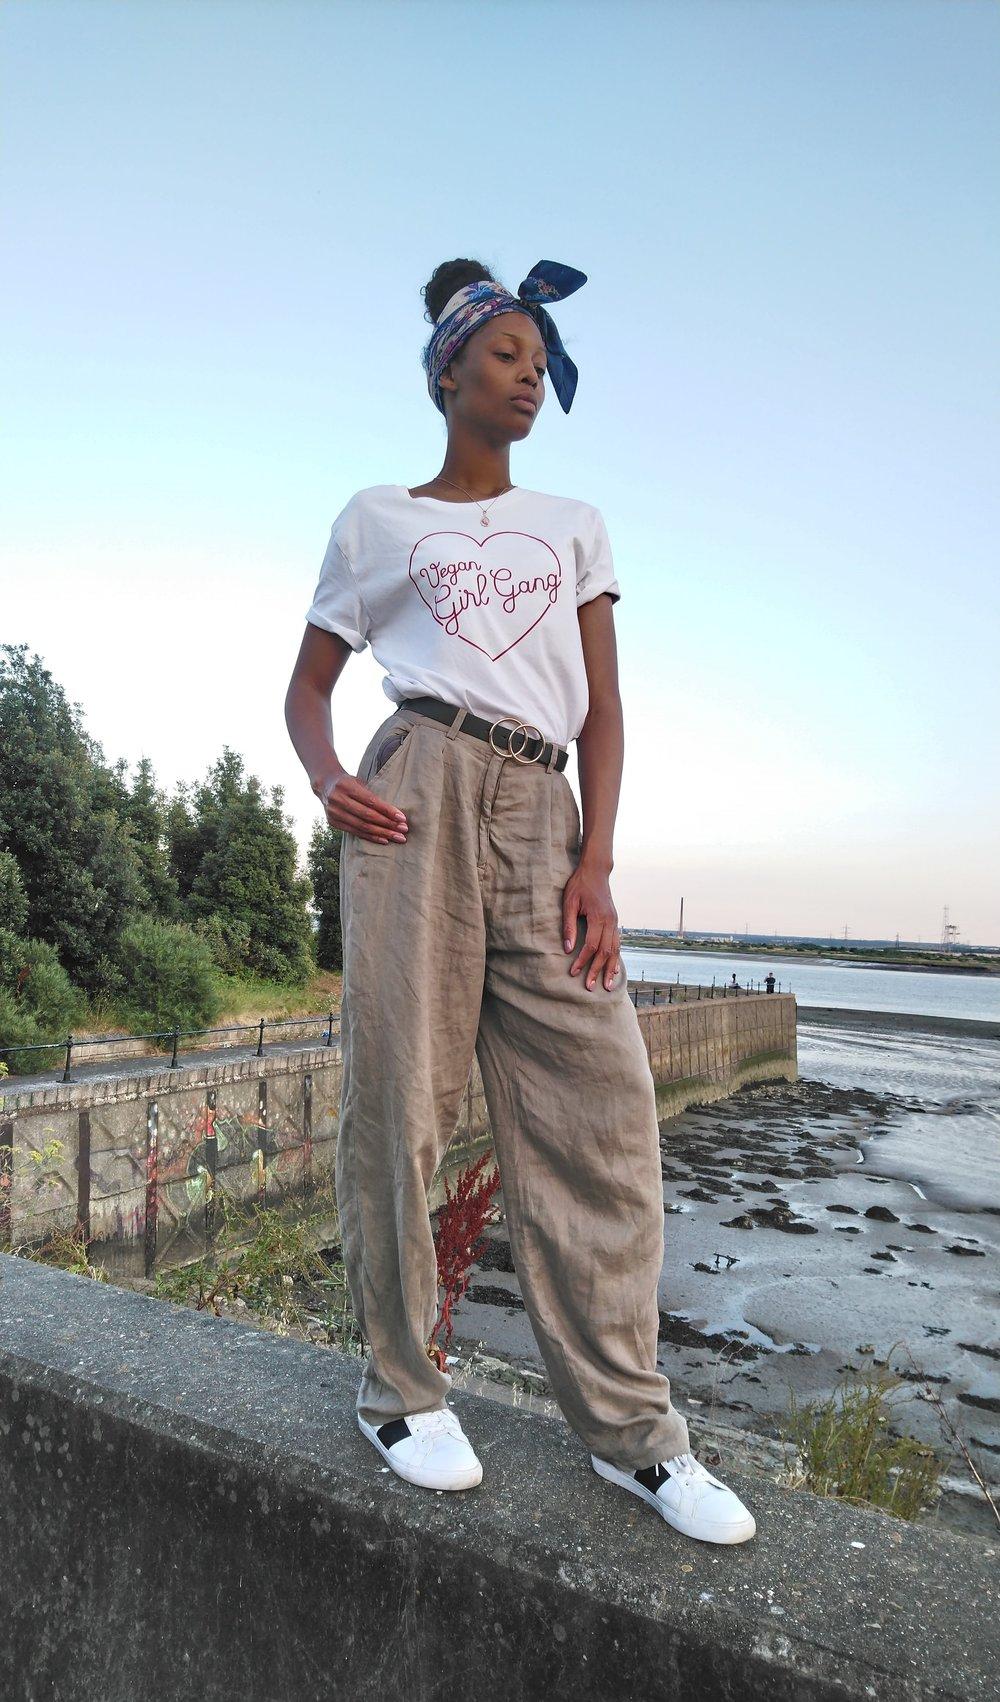 Kasia Vegan Girl Gang T-Shirt and Linen Trousers